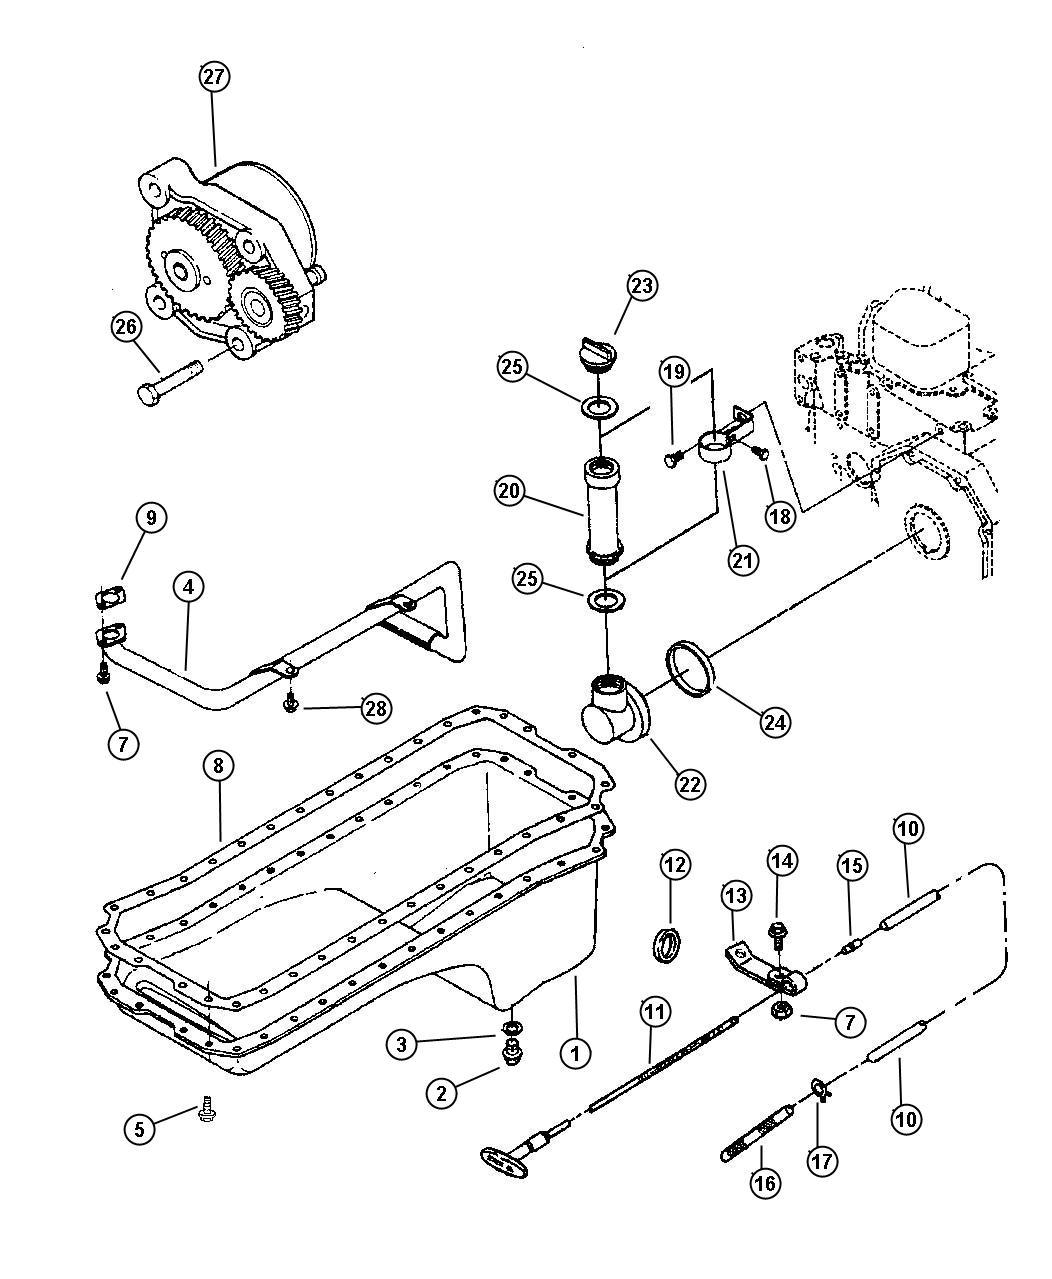 Dodge Ram 2500 Indicator. Engine oil level. Emissions